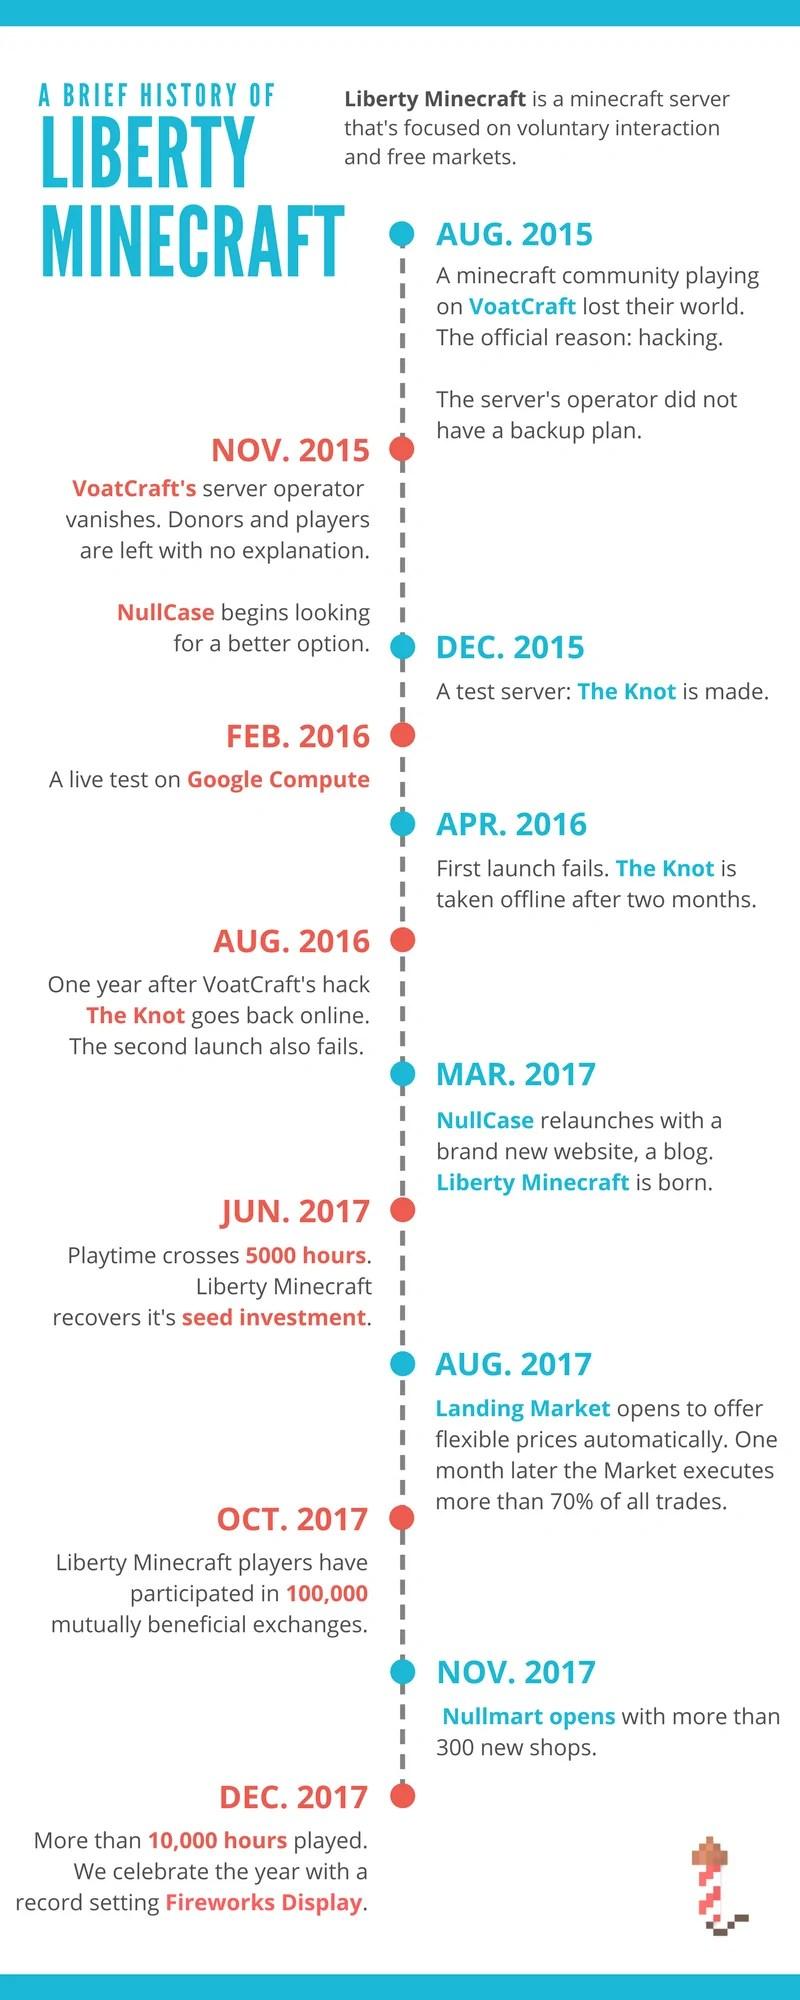 Brief History of Liberty Minecraft